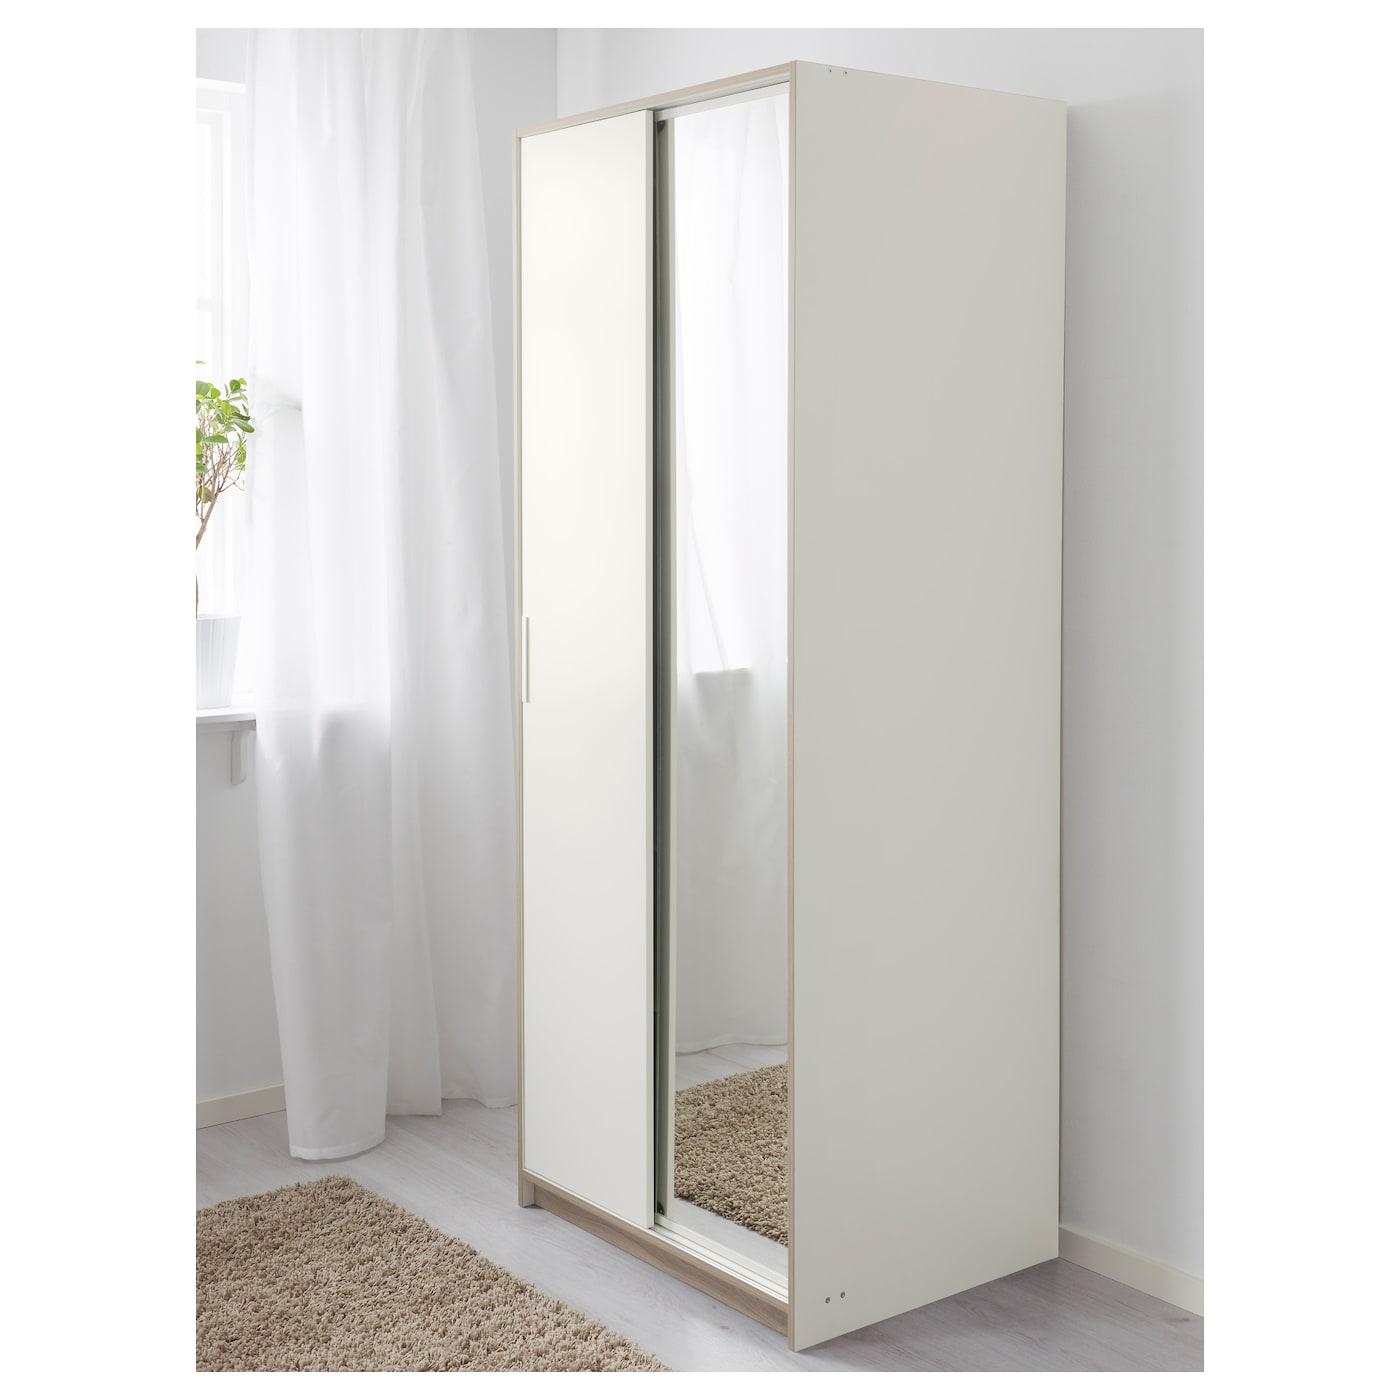 Trysil Wardrobe White Mirror Glass 79x61x202 Cm Ikea